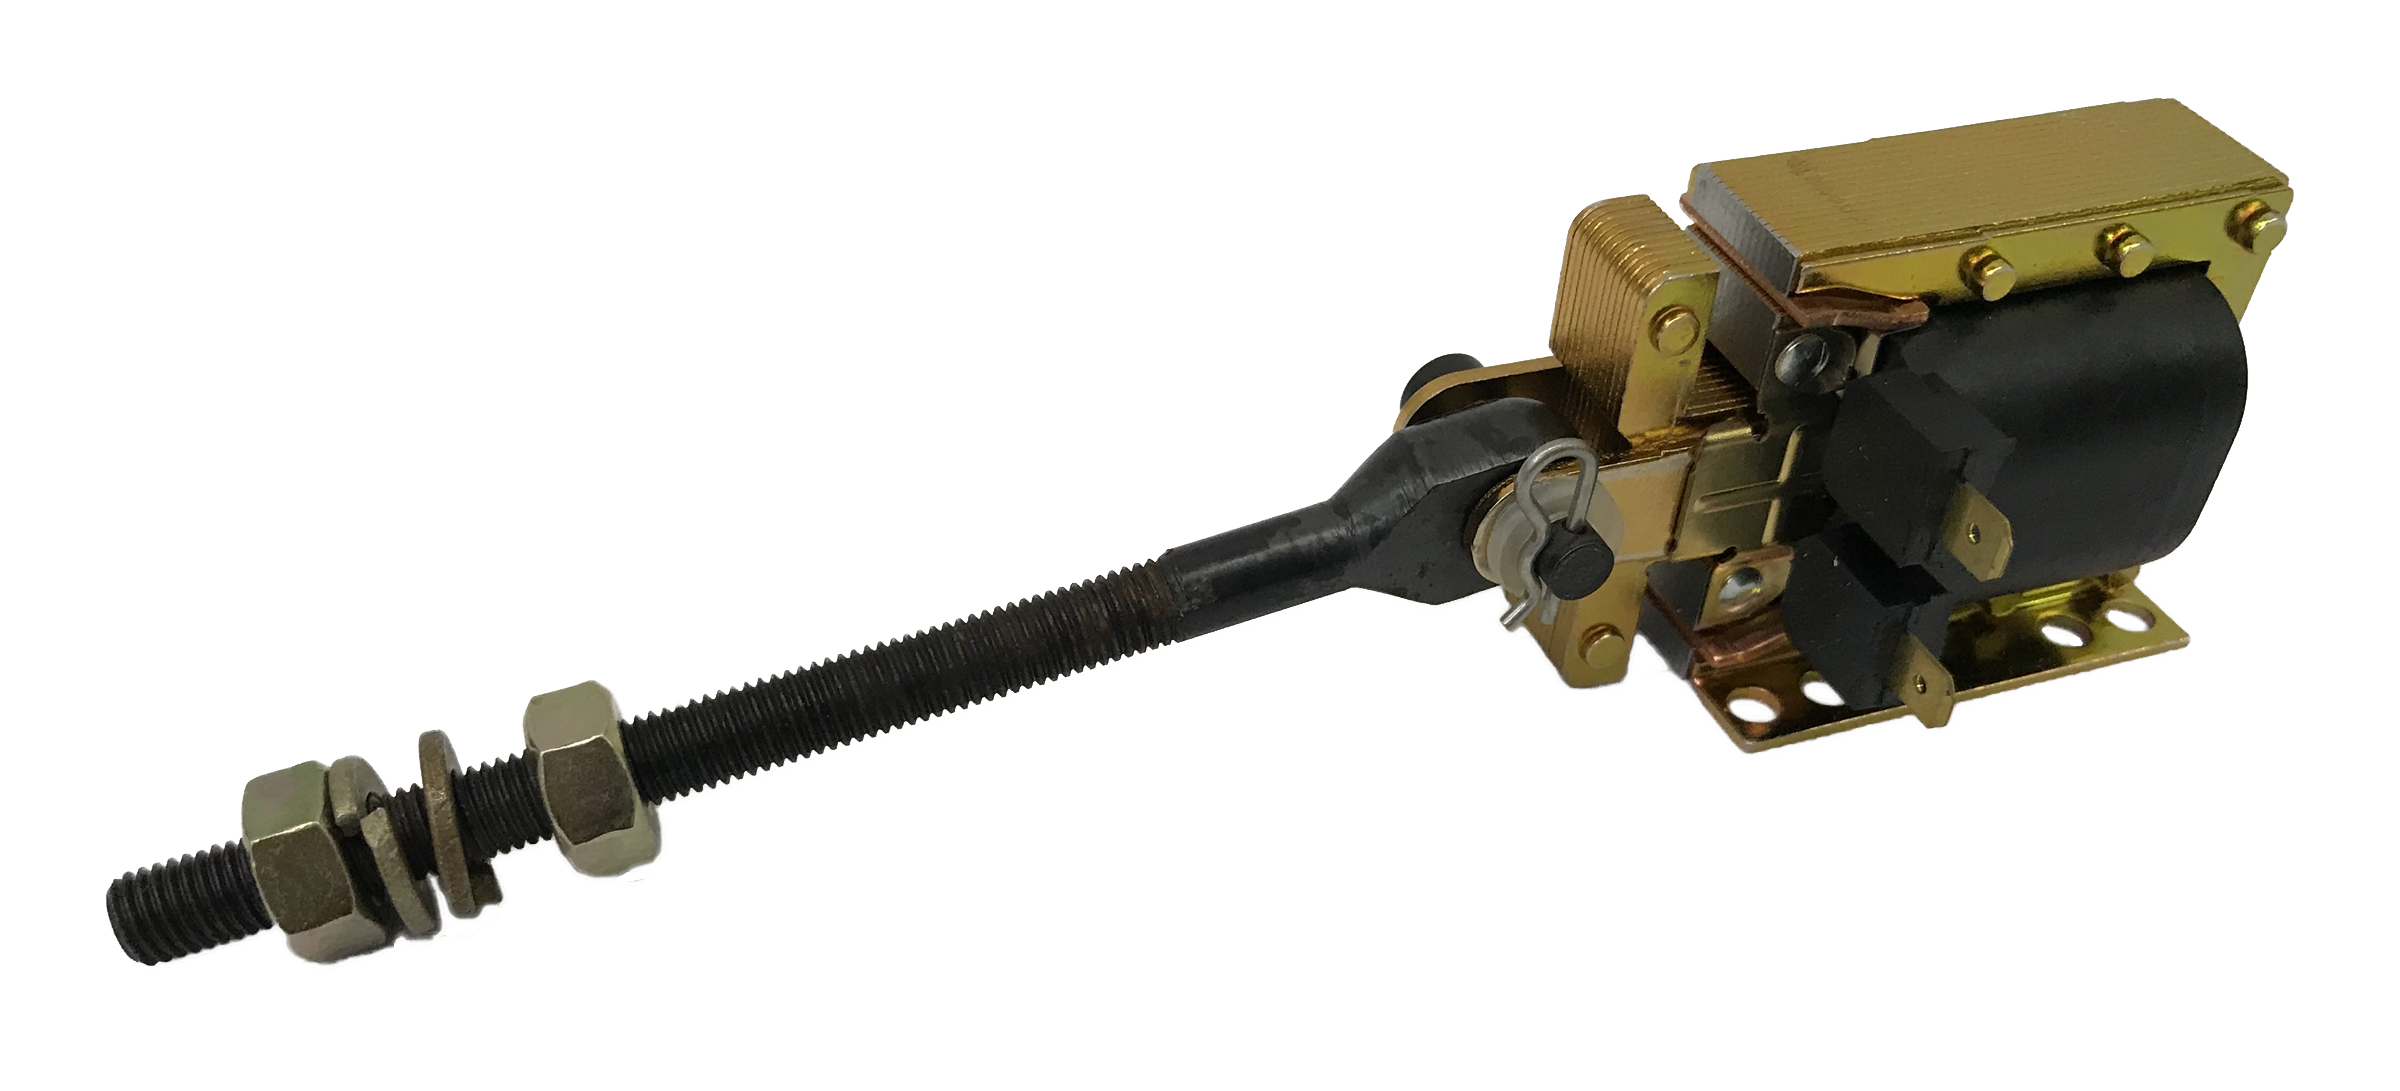 PulseRam Custom Solenoid with the Bolt